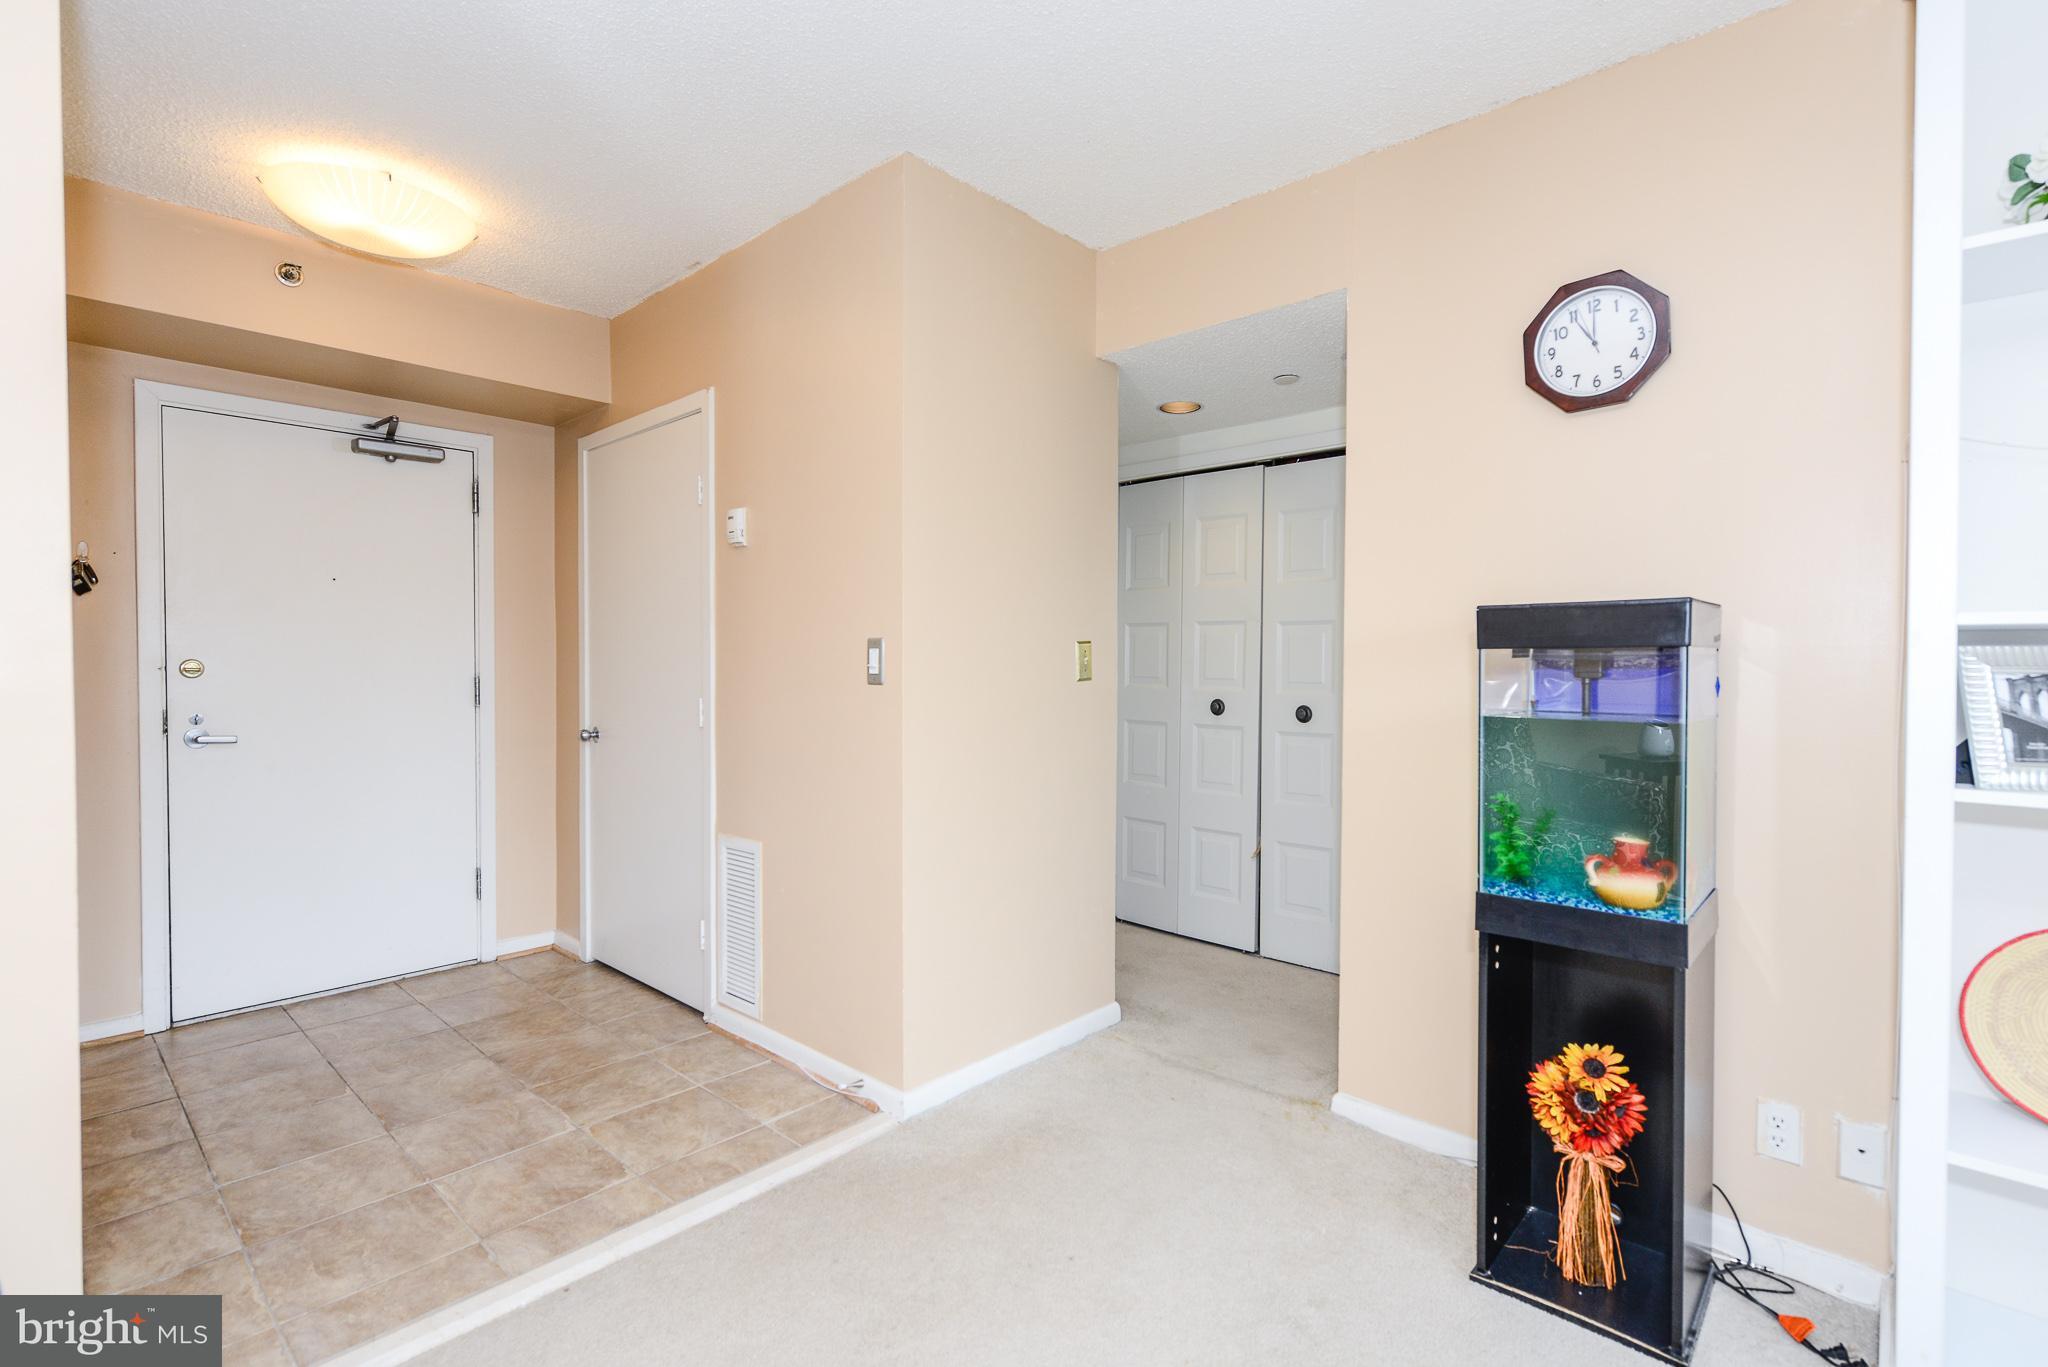 Unique Tjx Home Office Ensign - Home Decorating Inspiration - blanjo.com